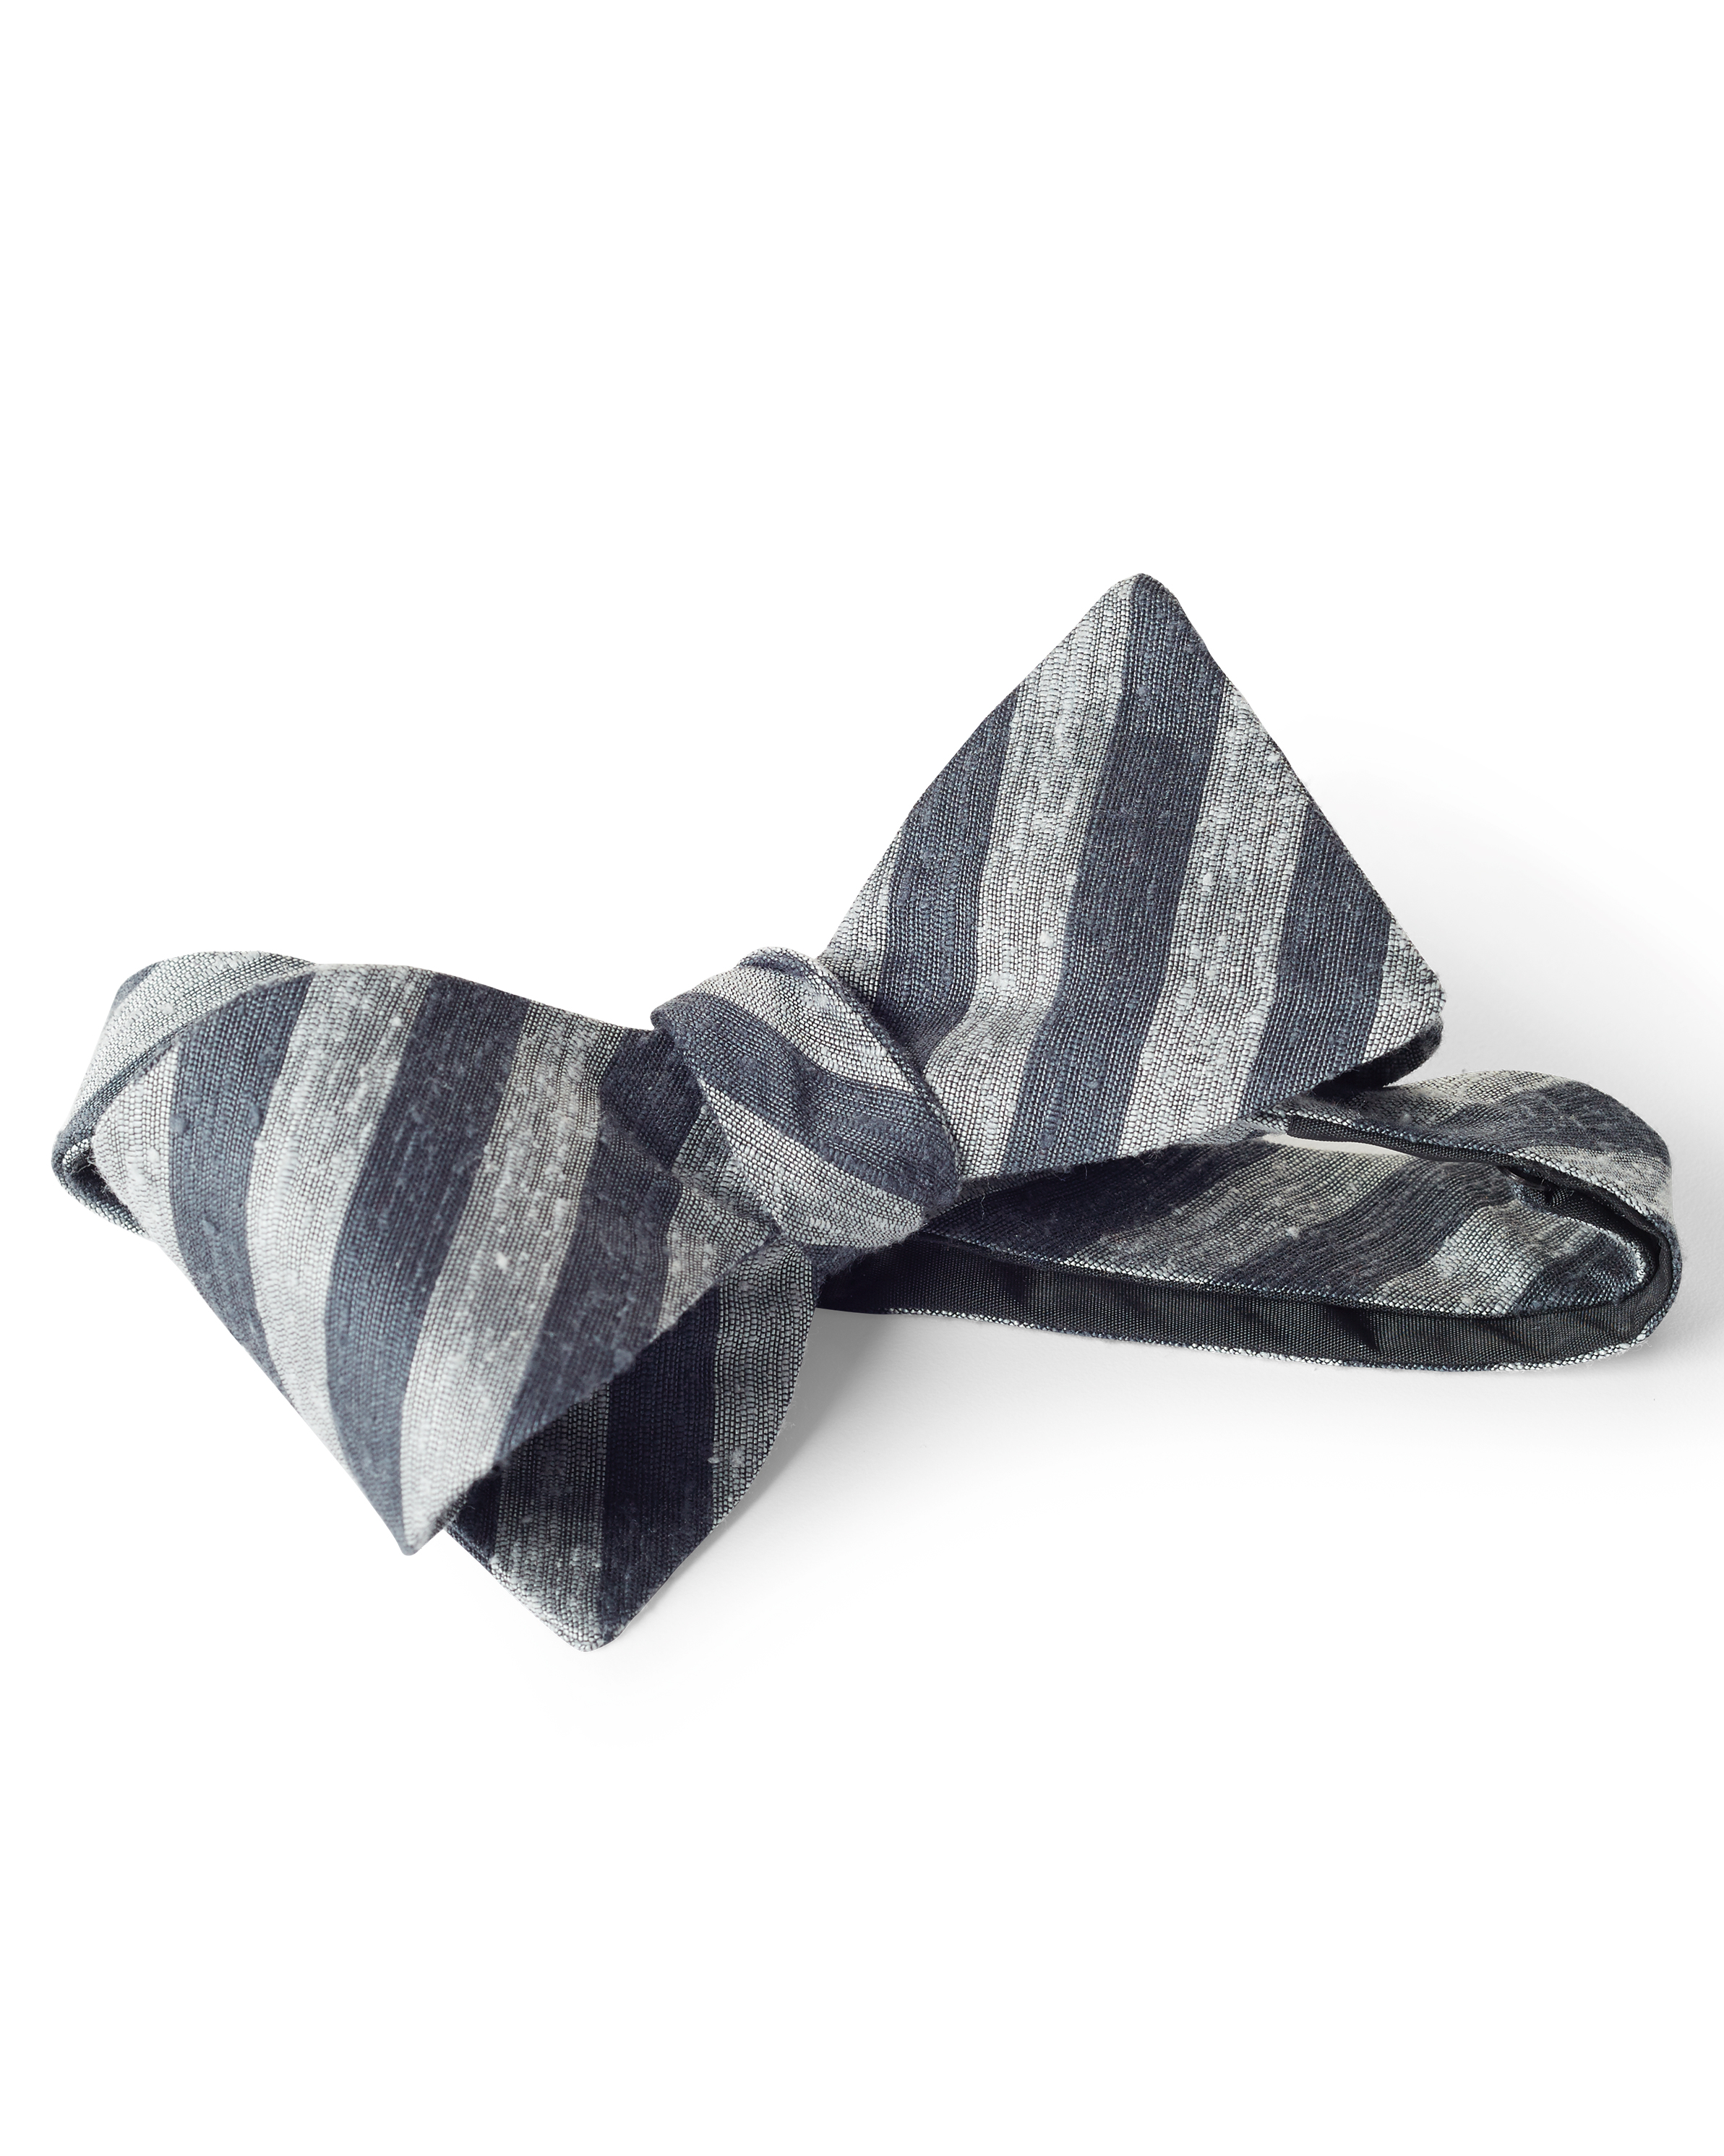 striped-bowtie-020-d111569.jpg